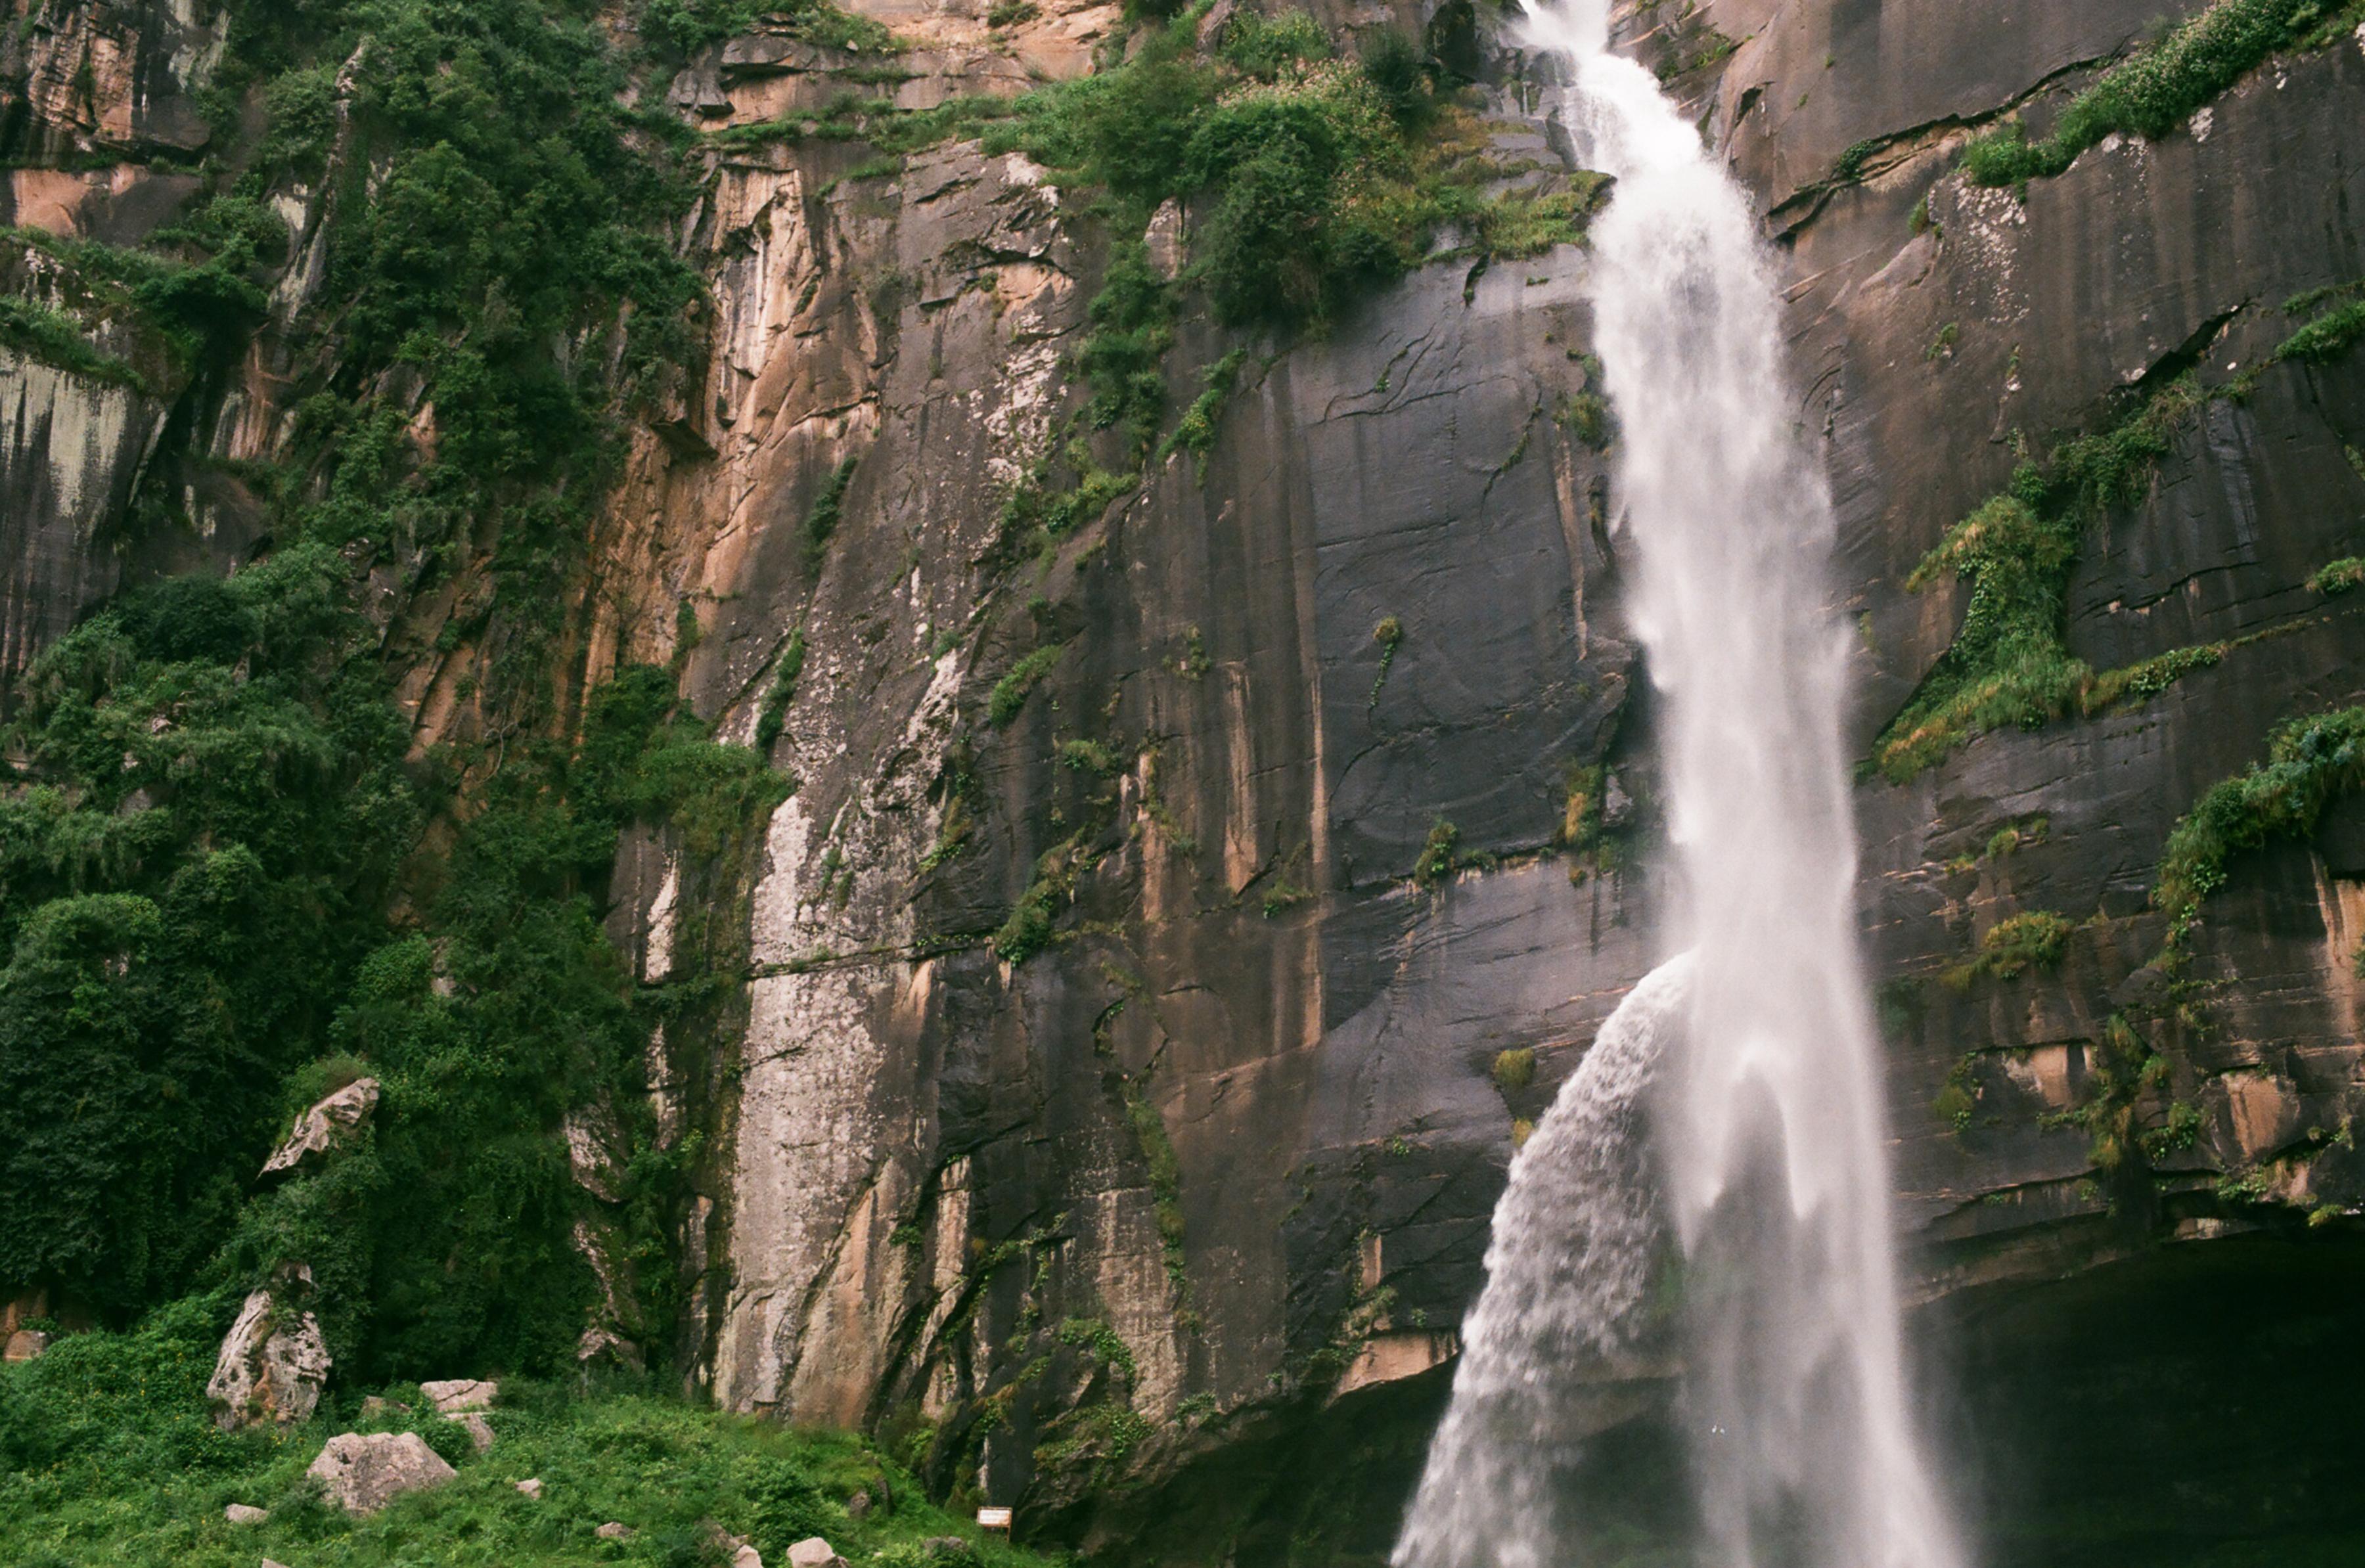 India waterfall landscape 35mm film